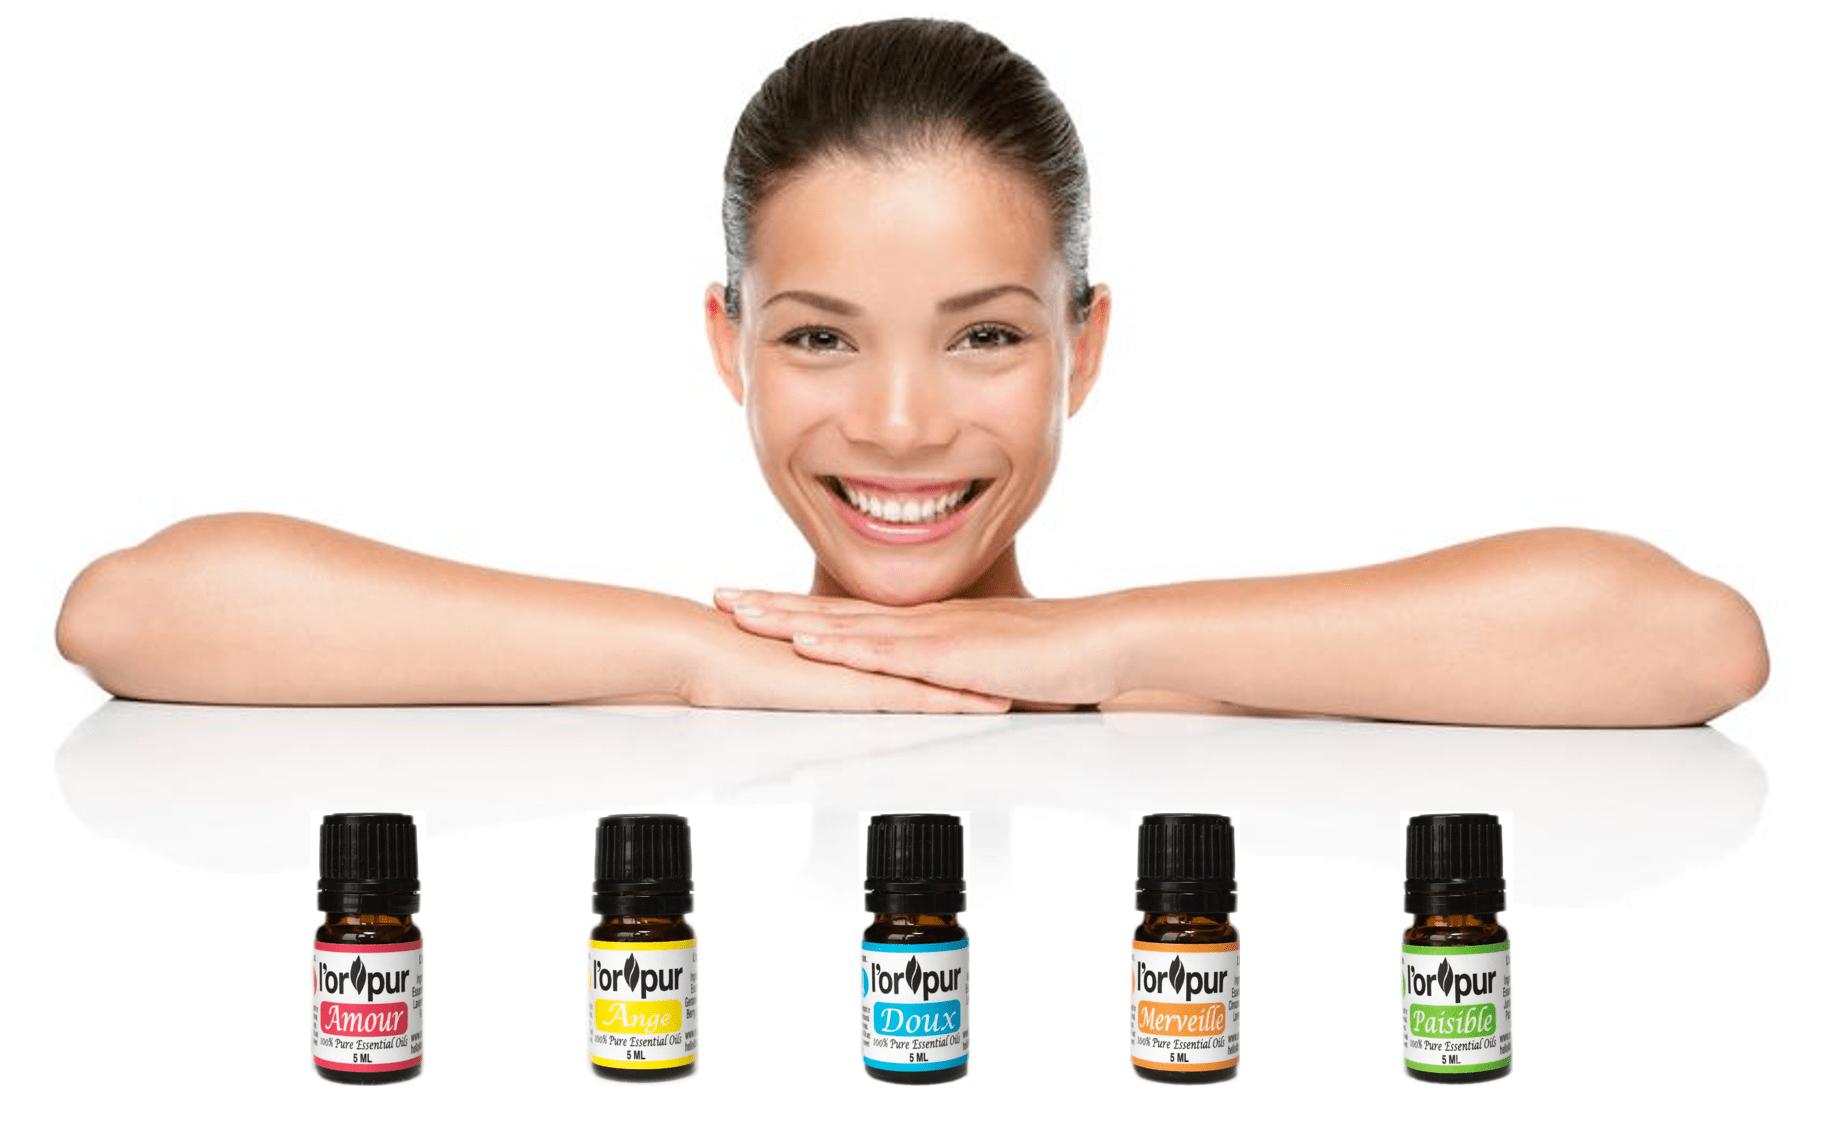 L'orpur Essential Oil Blends Kit